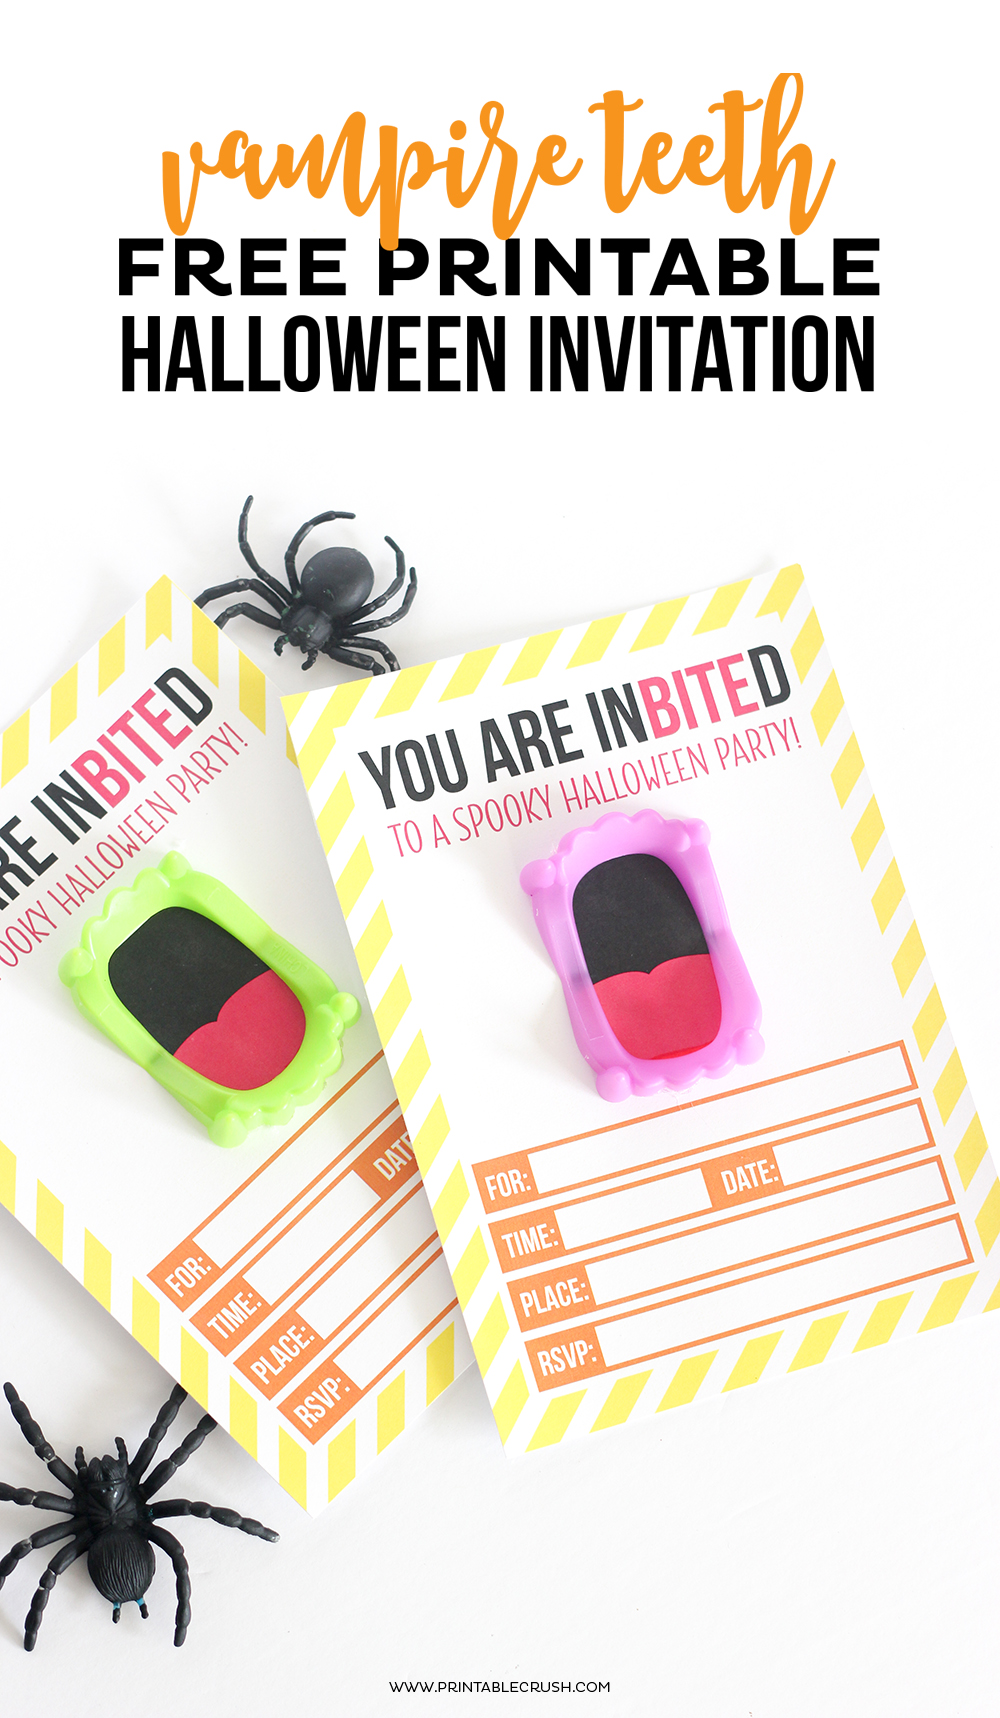 image about Printable Halloween Invitations titled Free of charge Printable Vampire Halloween Invitation - Printable Crush